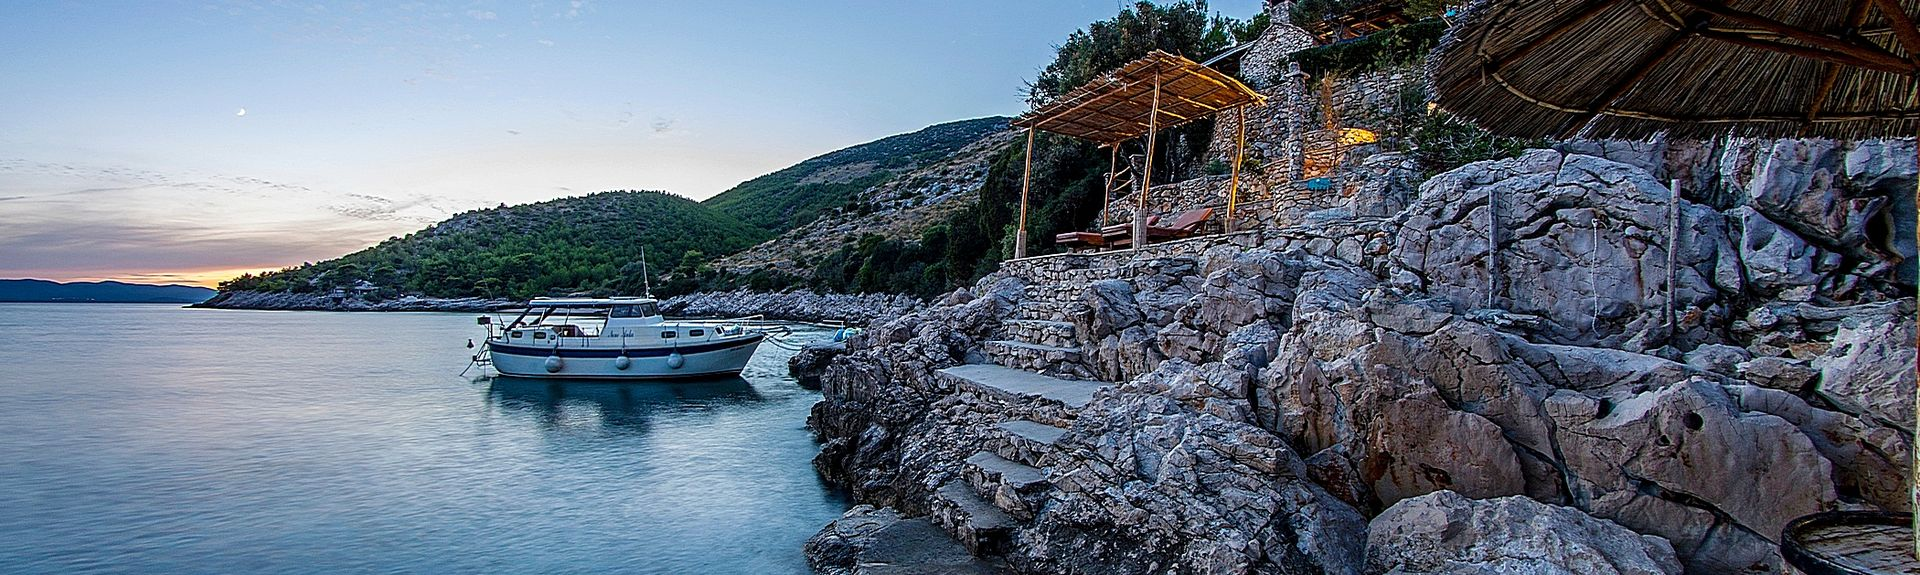 Strand von Markarska, Makarska, Gespanschaft Split-Dalmatien, Kroatien